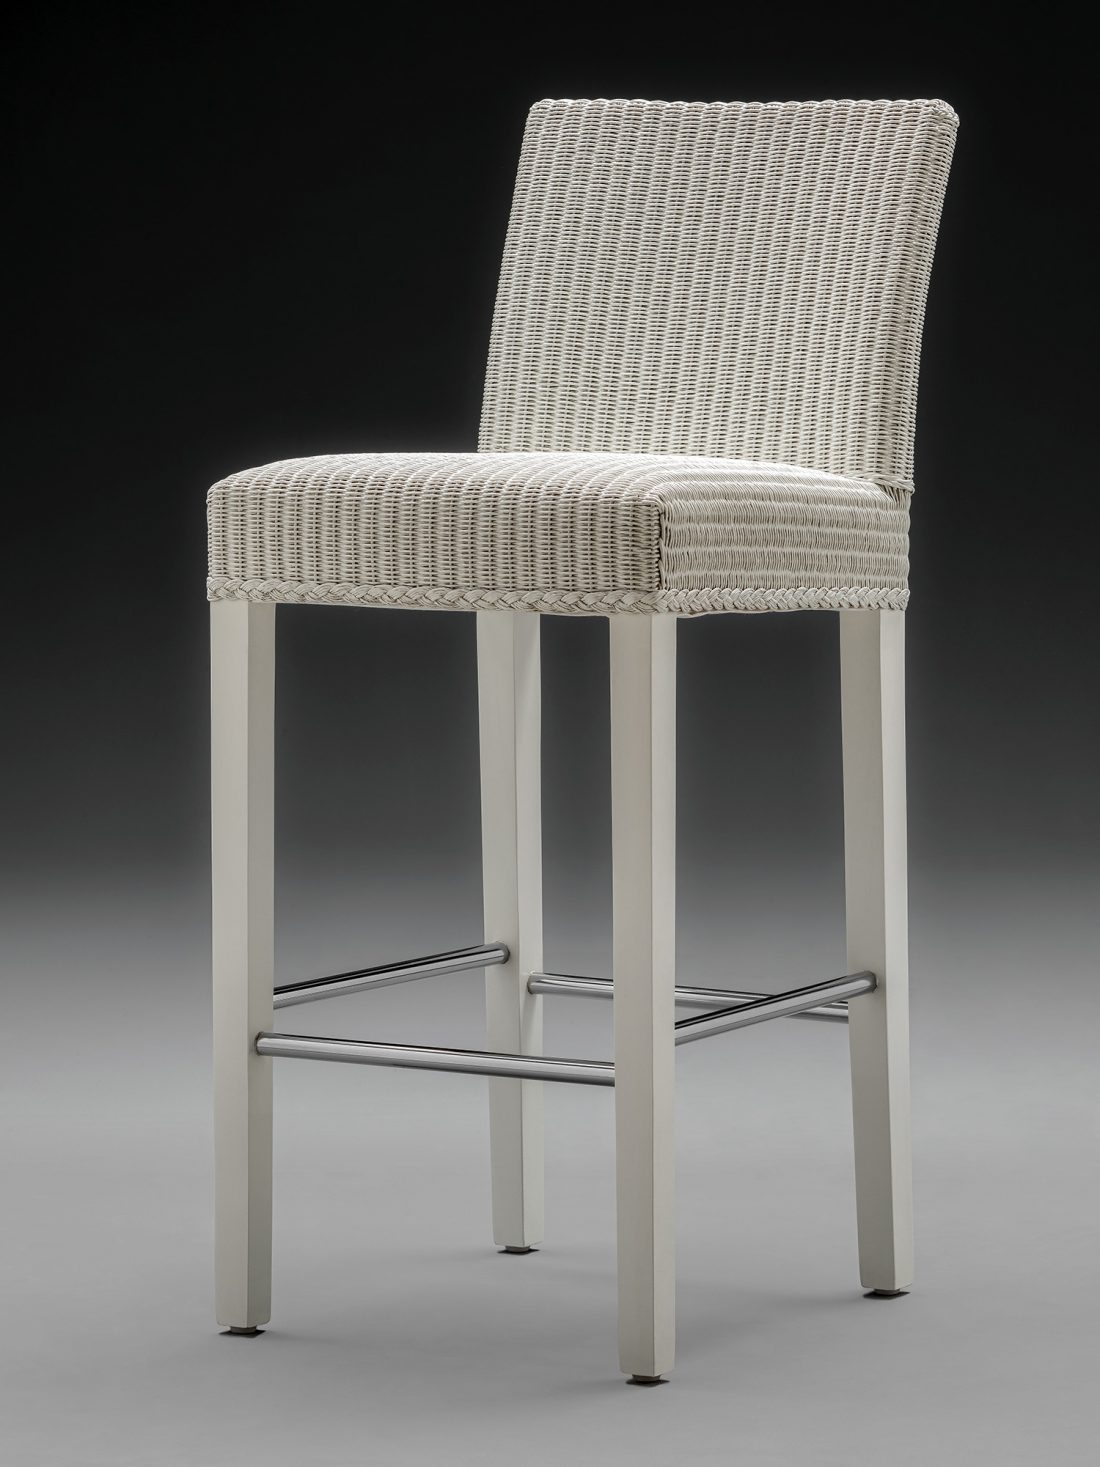 Lloyd Loom Belgravia Bar Chair Front View Soho White